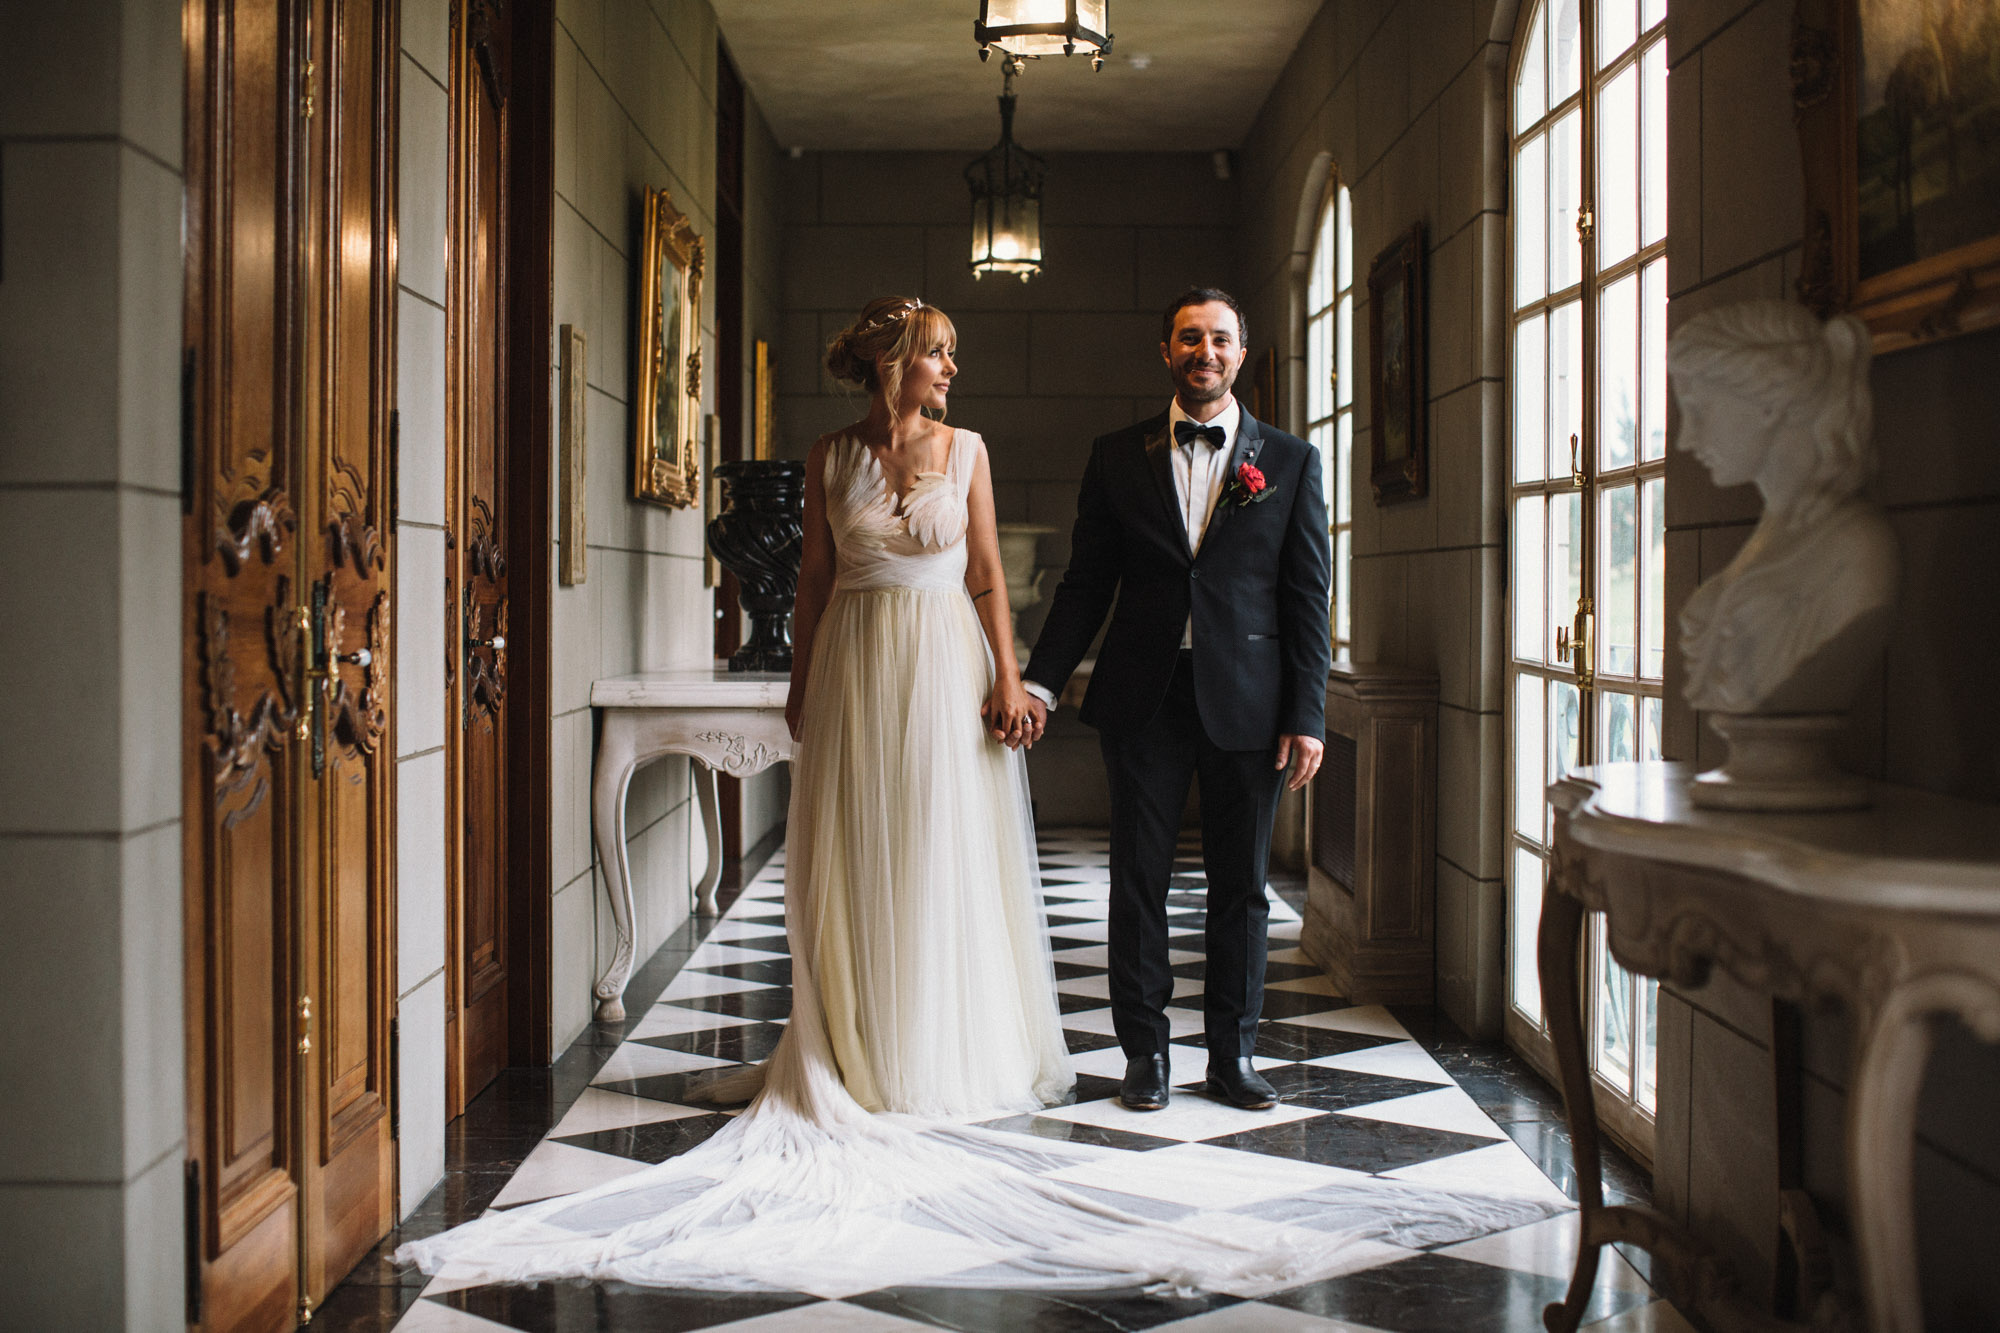 Campbell Point House Wedding HJ + Dean Raphael Weddings-112.jpg